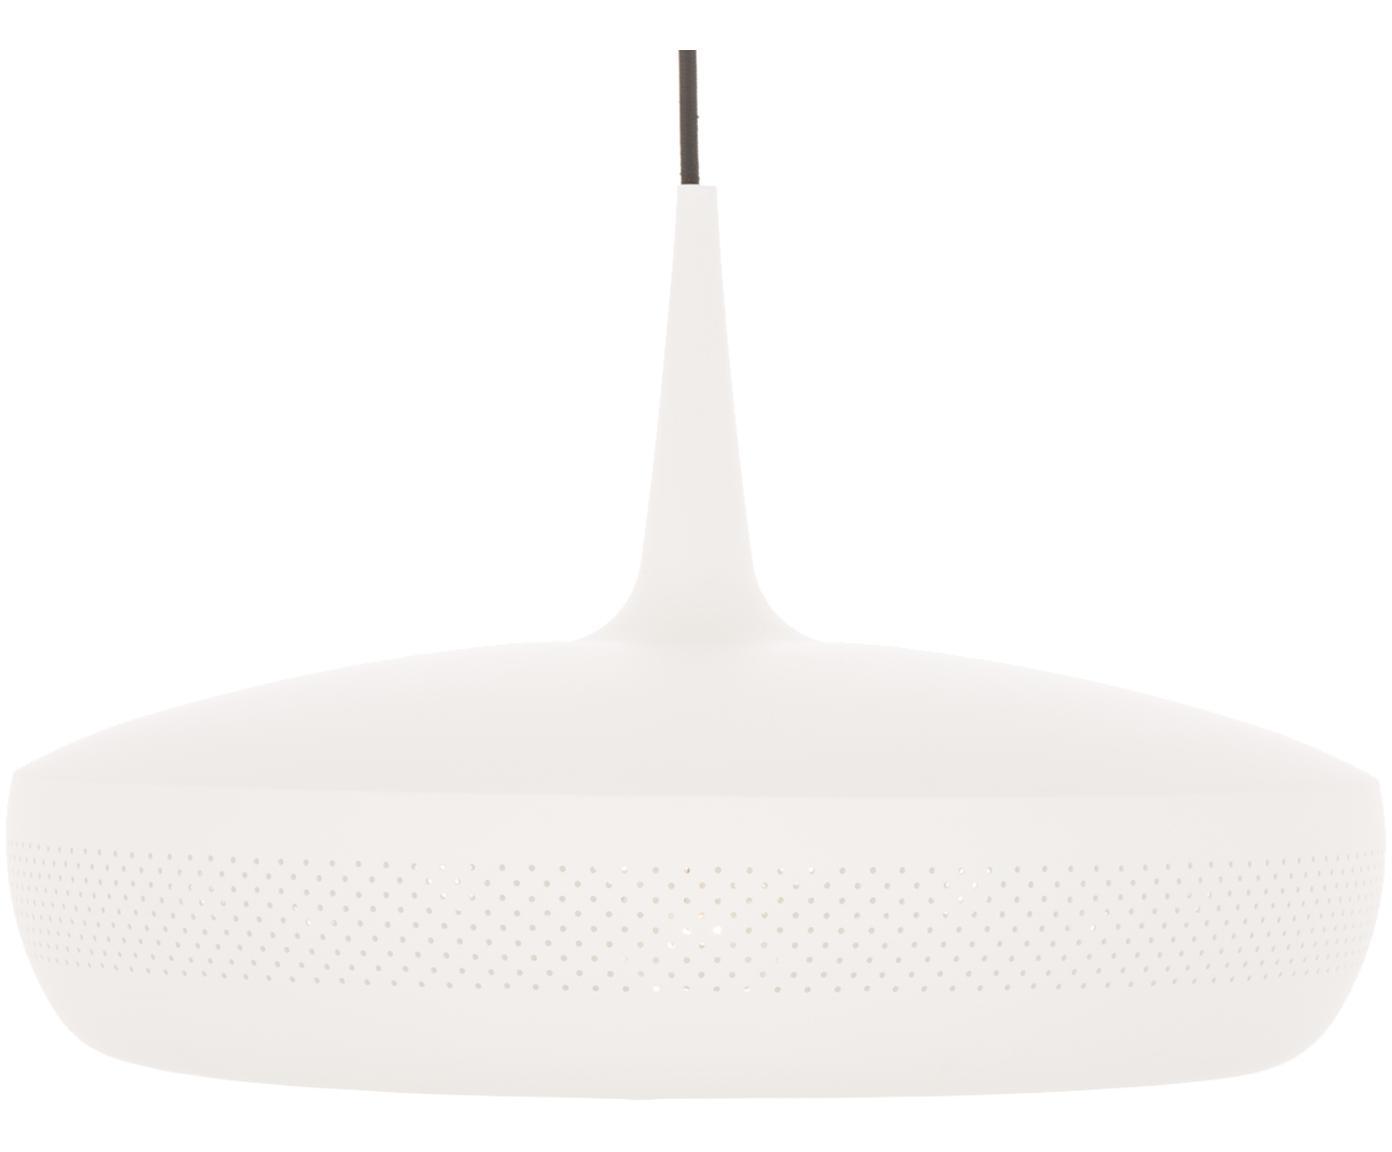 Lampada a sospensione bianca Clava Dine, Paralume: alluminio rivestito, Bianco opaco, Ø 43 x Alt. 28 cm